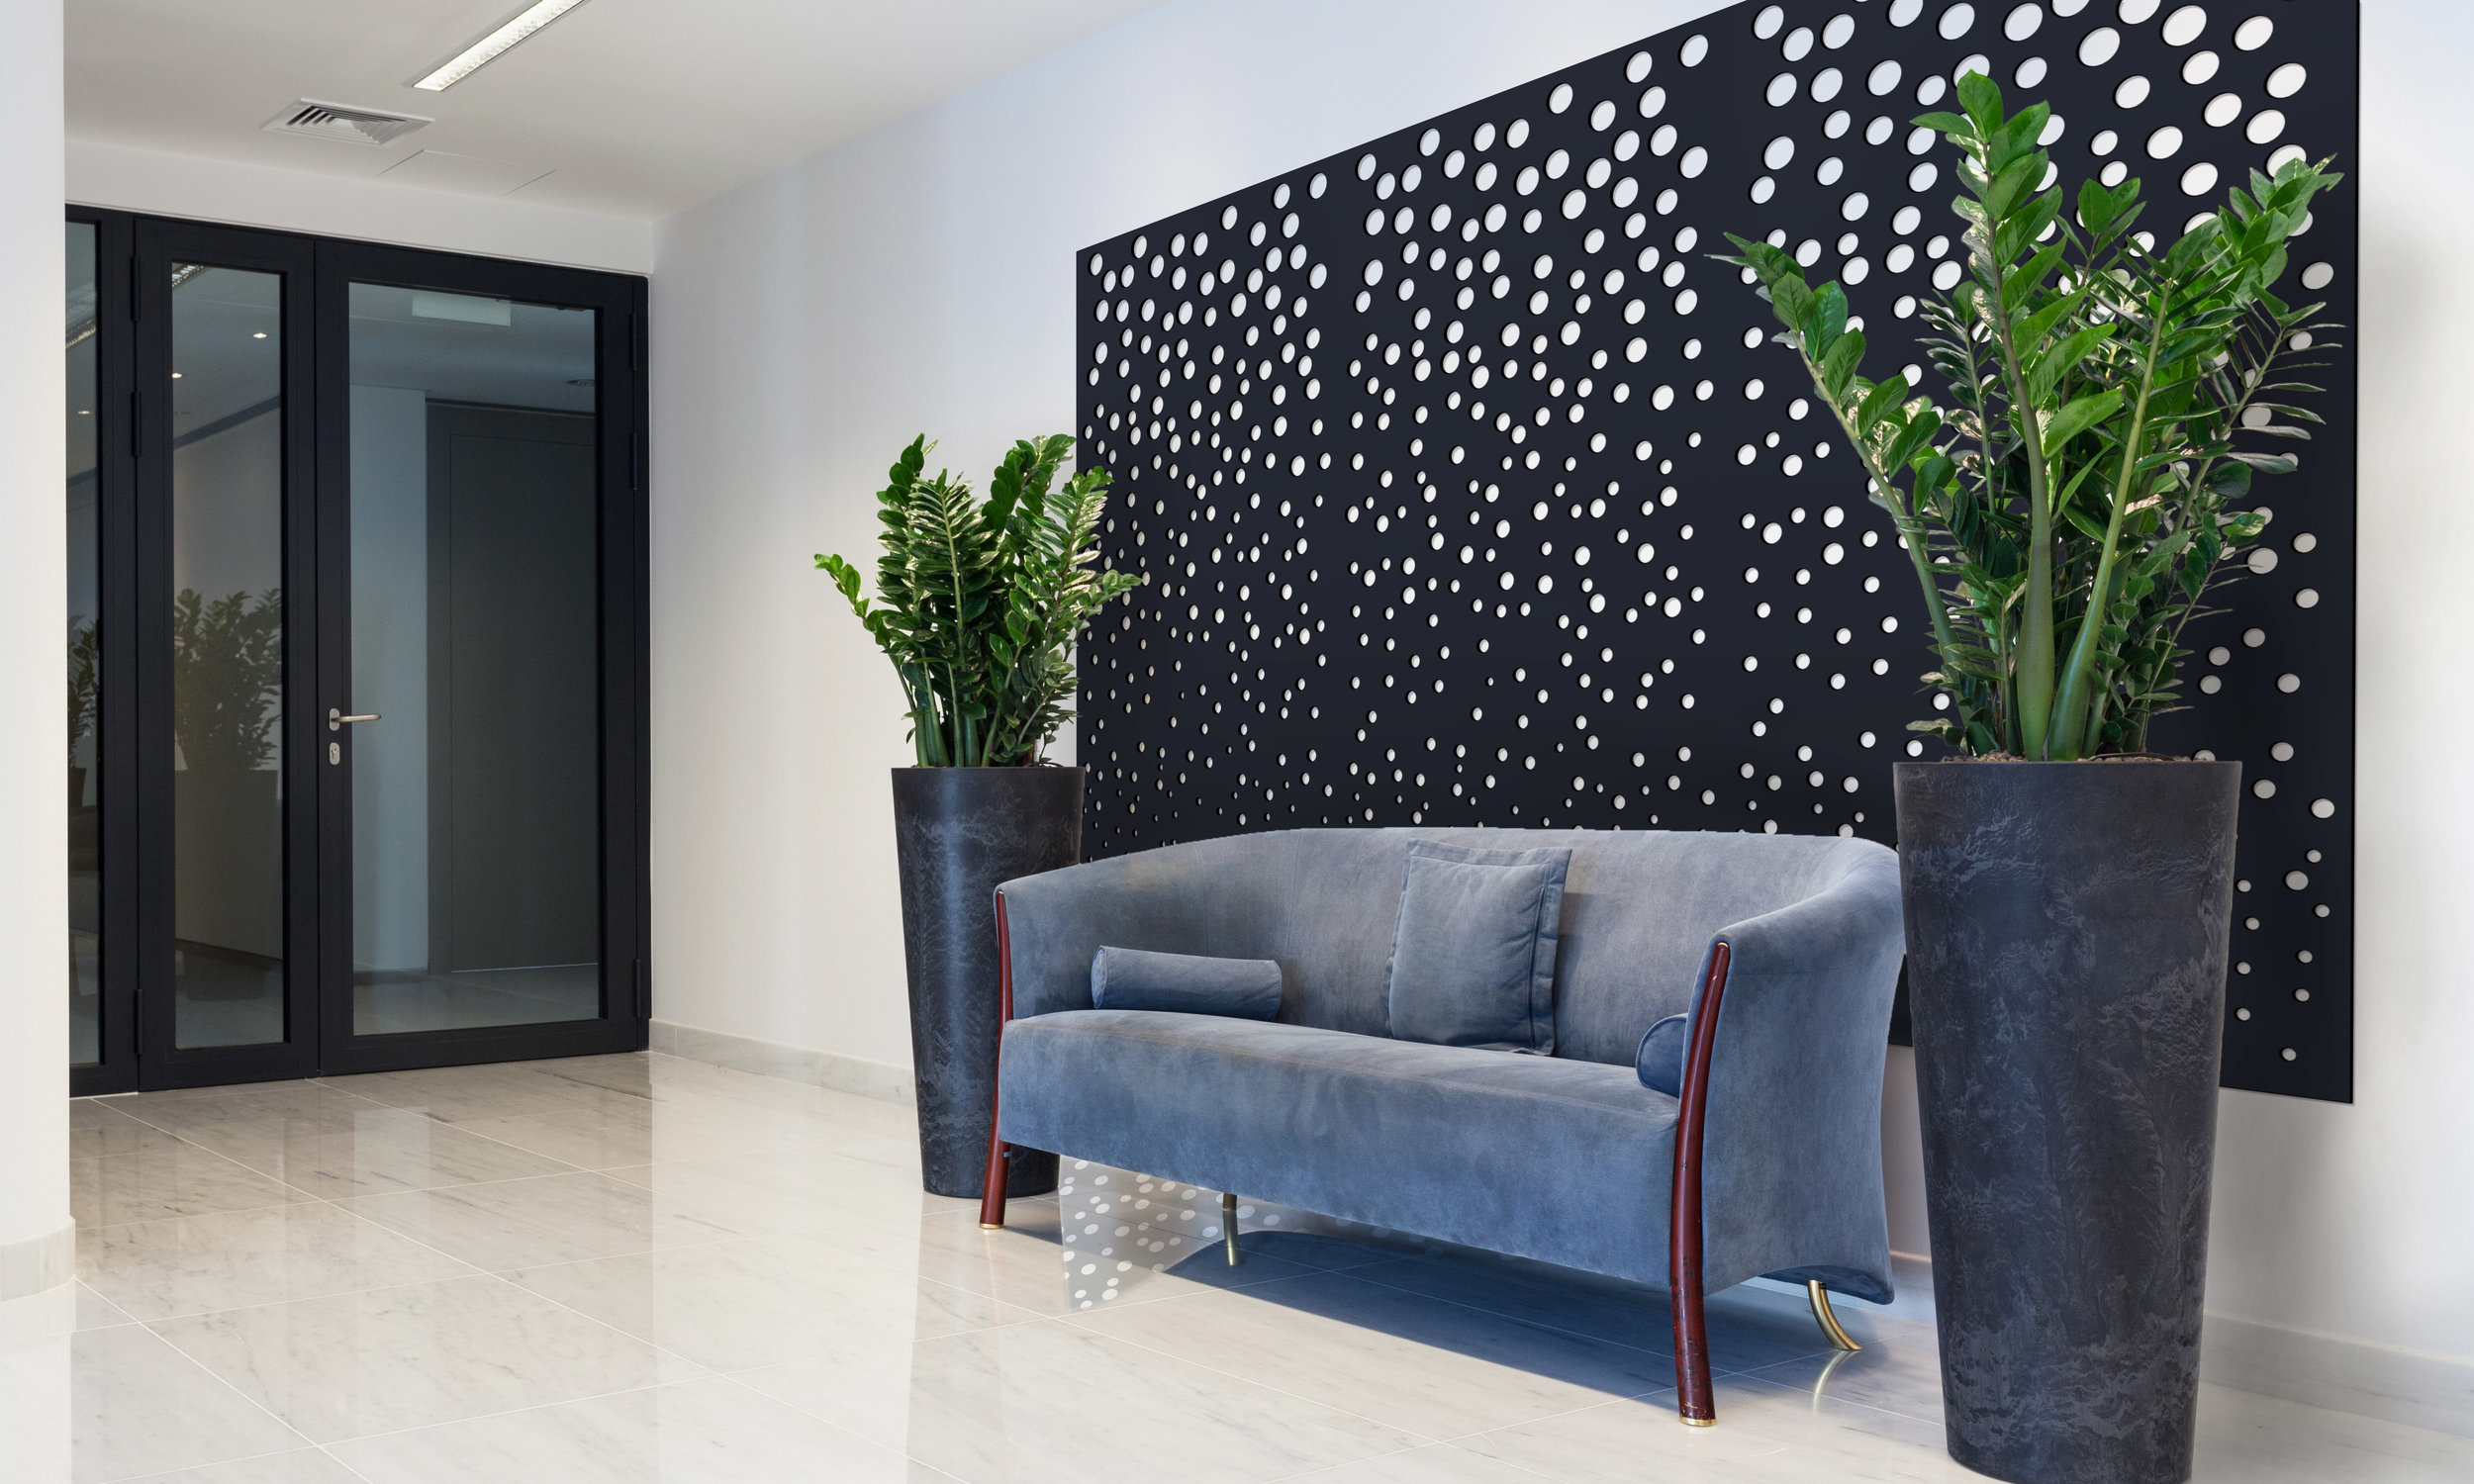 Installation Rendering B   Casablanca decorative office wall panel - painted